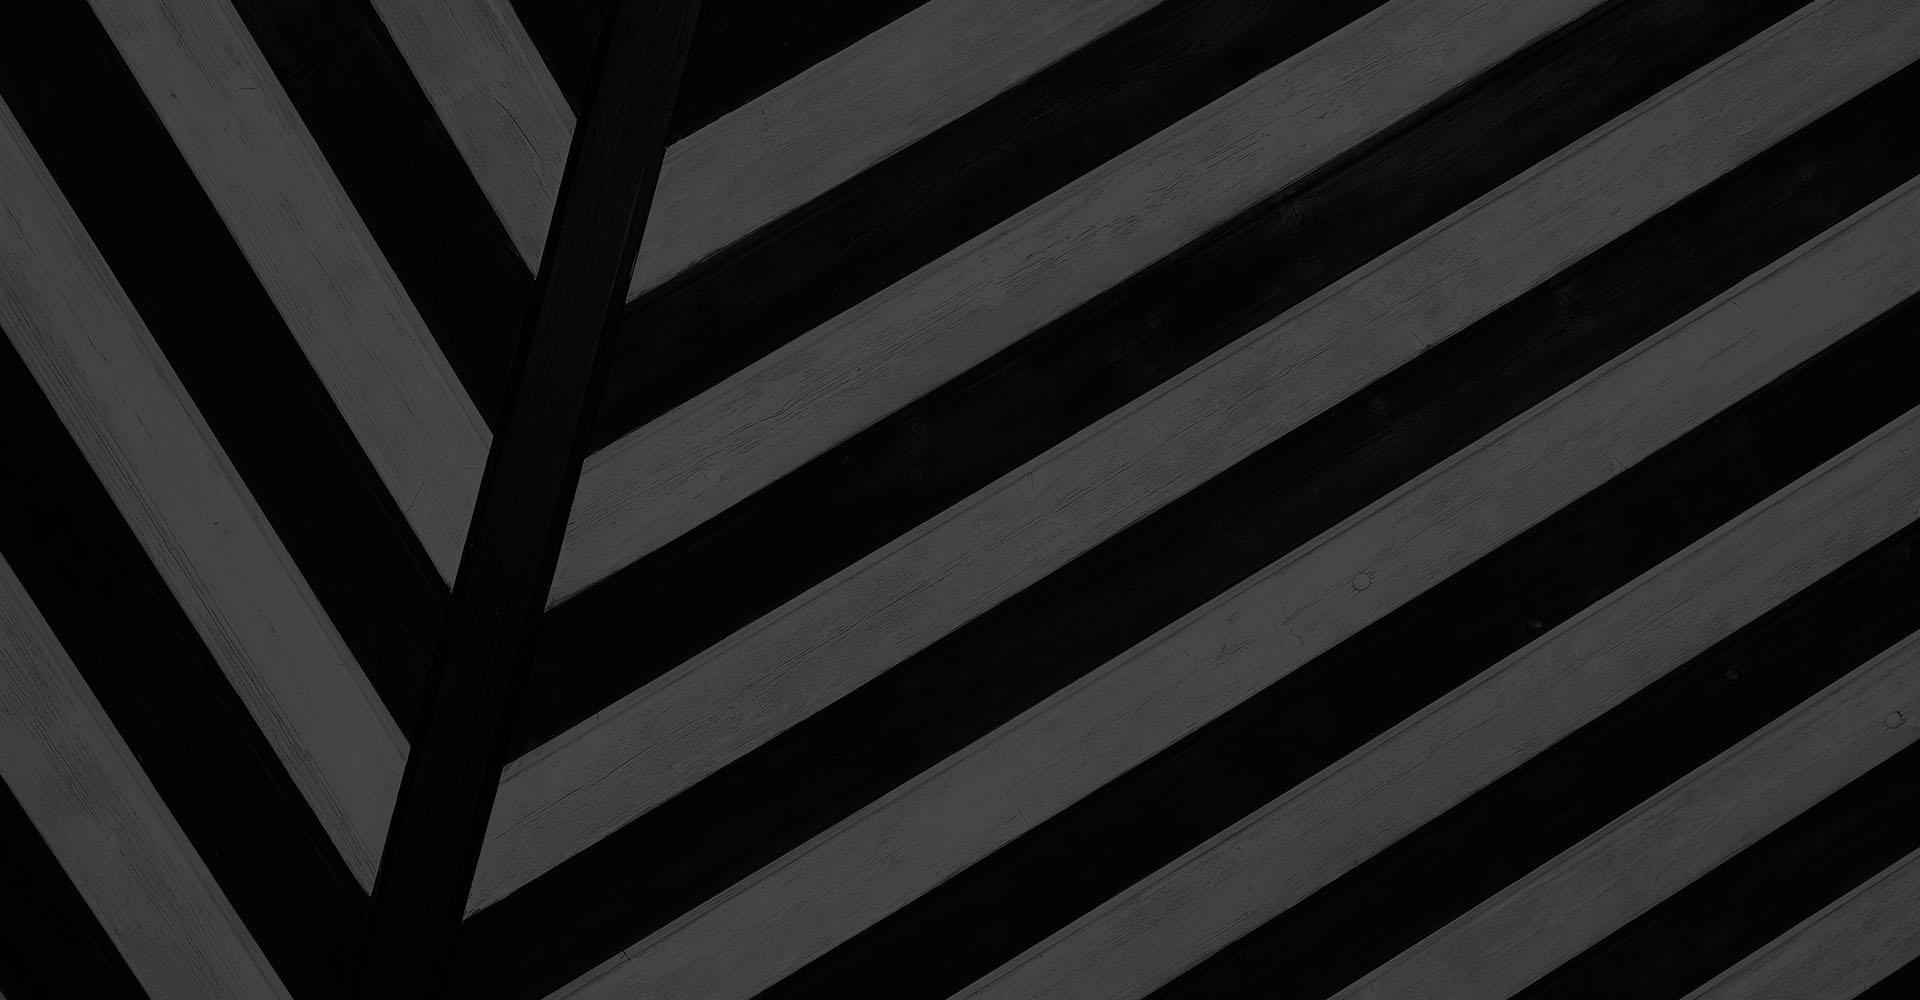 Black rectangle lines